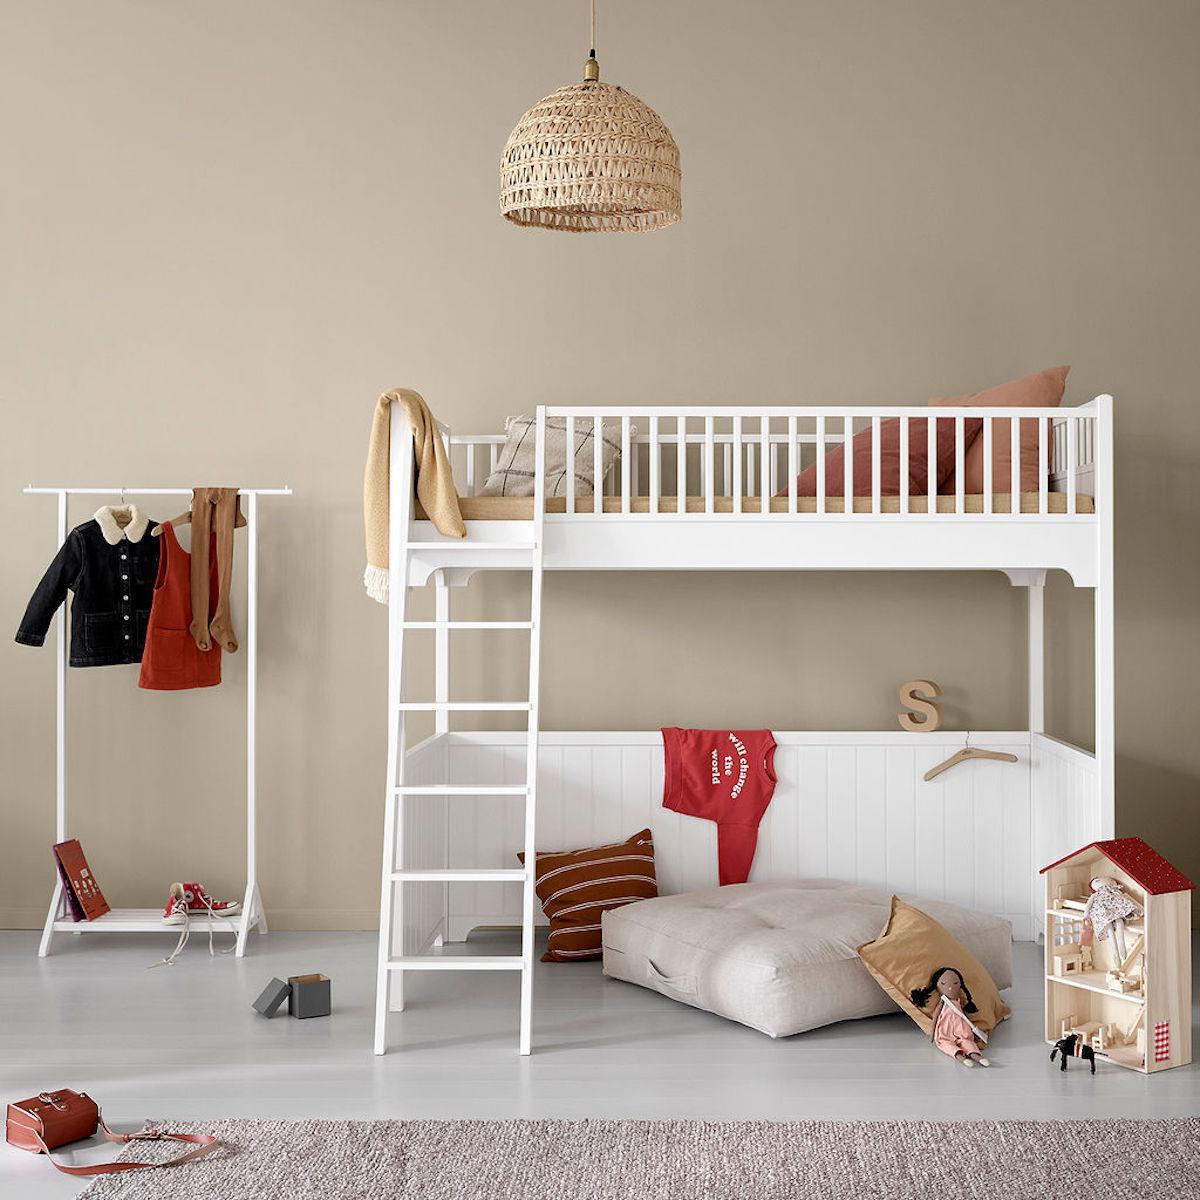 Lit mezzanine 90x200cm SEASIDE CLASSIC Oliver Furniture blanc